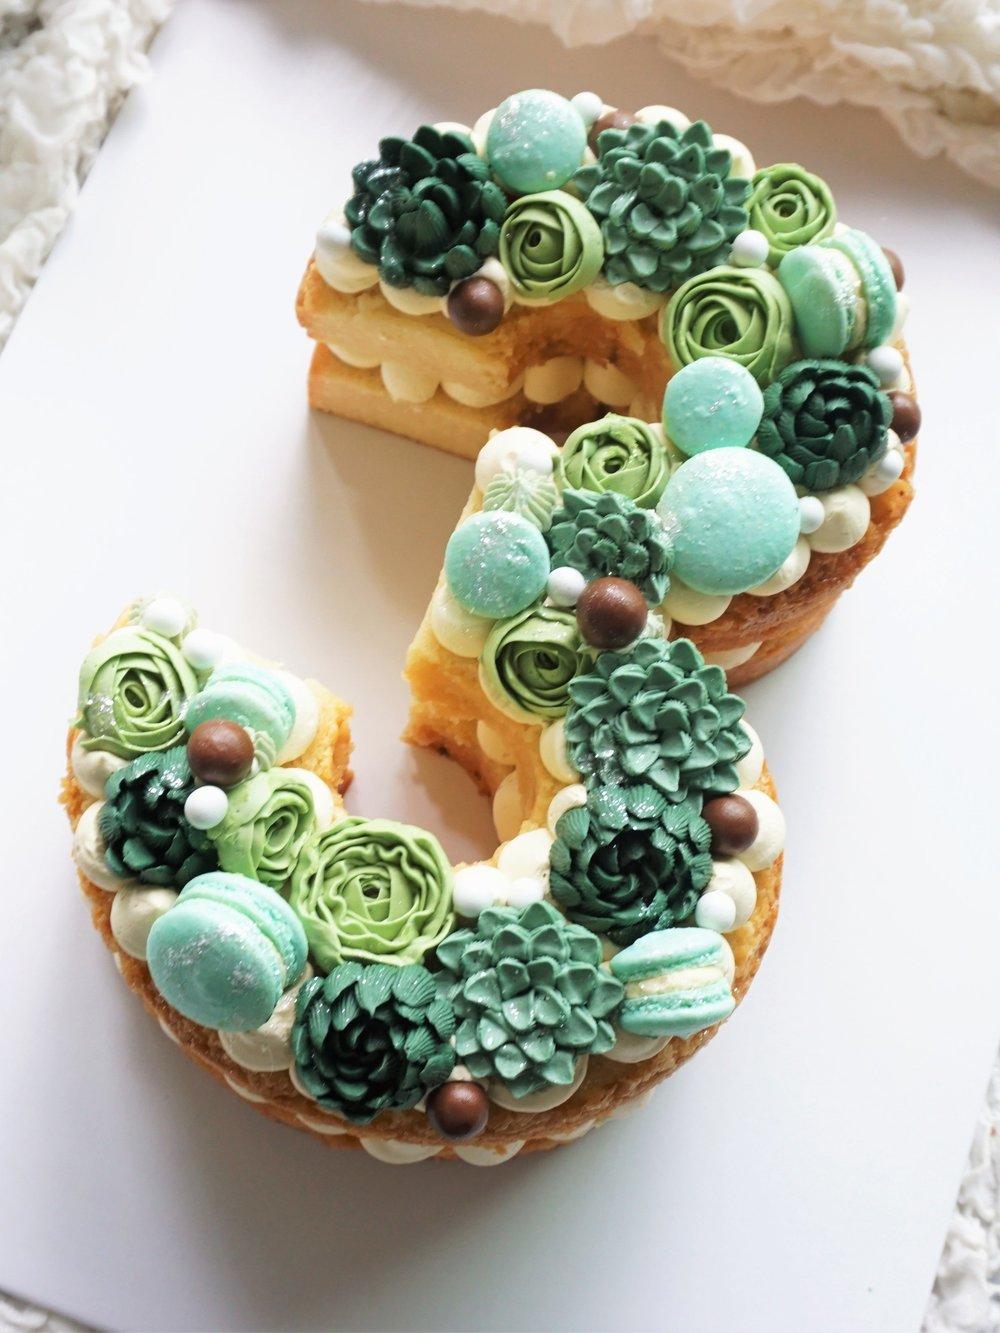 Cakes_By_Aranee_Perth_Drip_Cakes_Custom_Cakes_Wedding_Cakes_Macarons_Cupcakes_Personalised_Cookies_CAKES_Gallery4.jpg